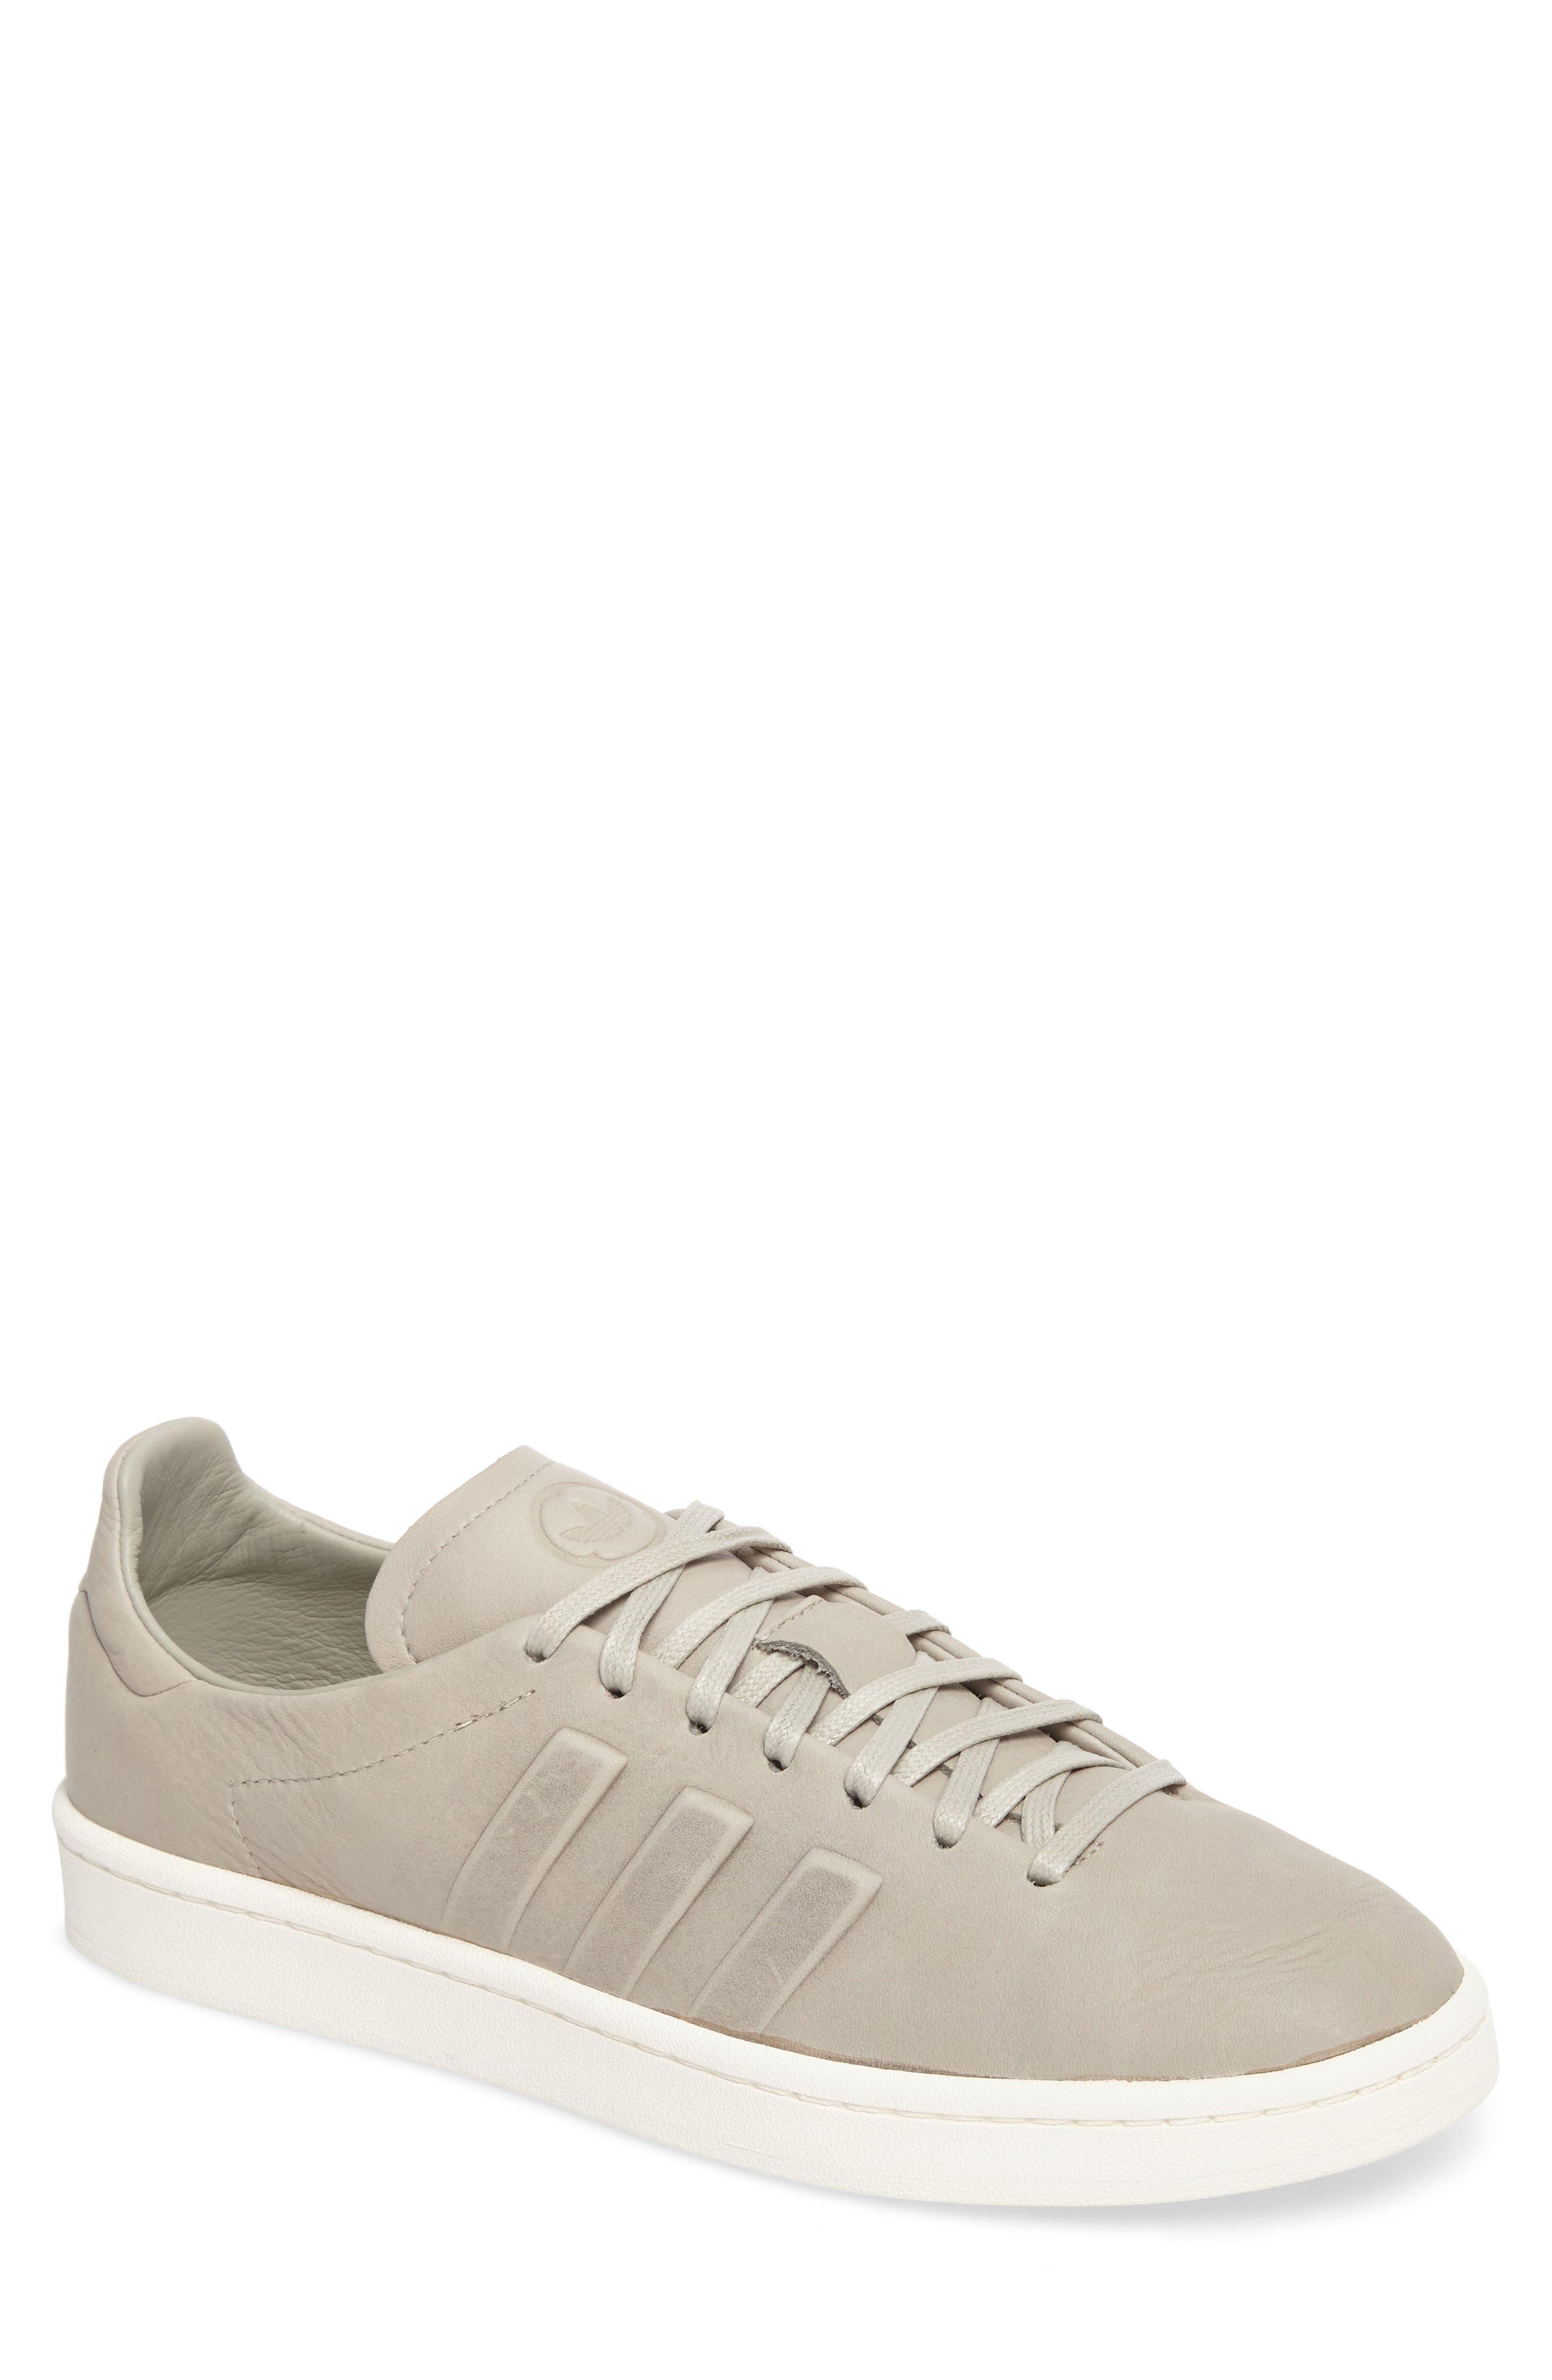 Low Top Sneaker,                         Main,                         color, Sesame/ Chalk White